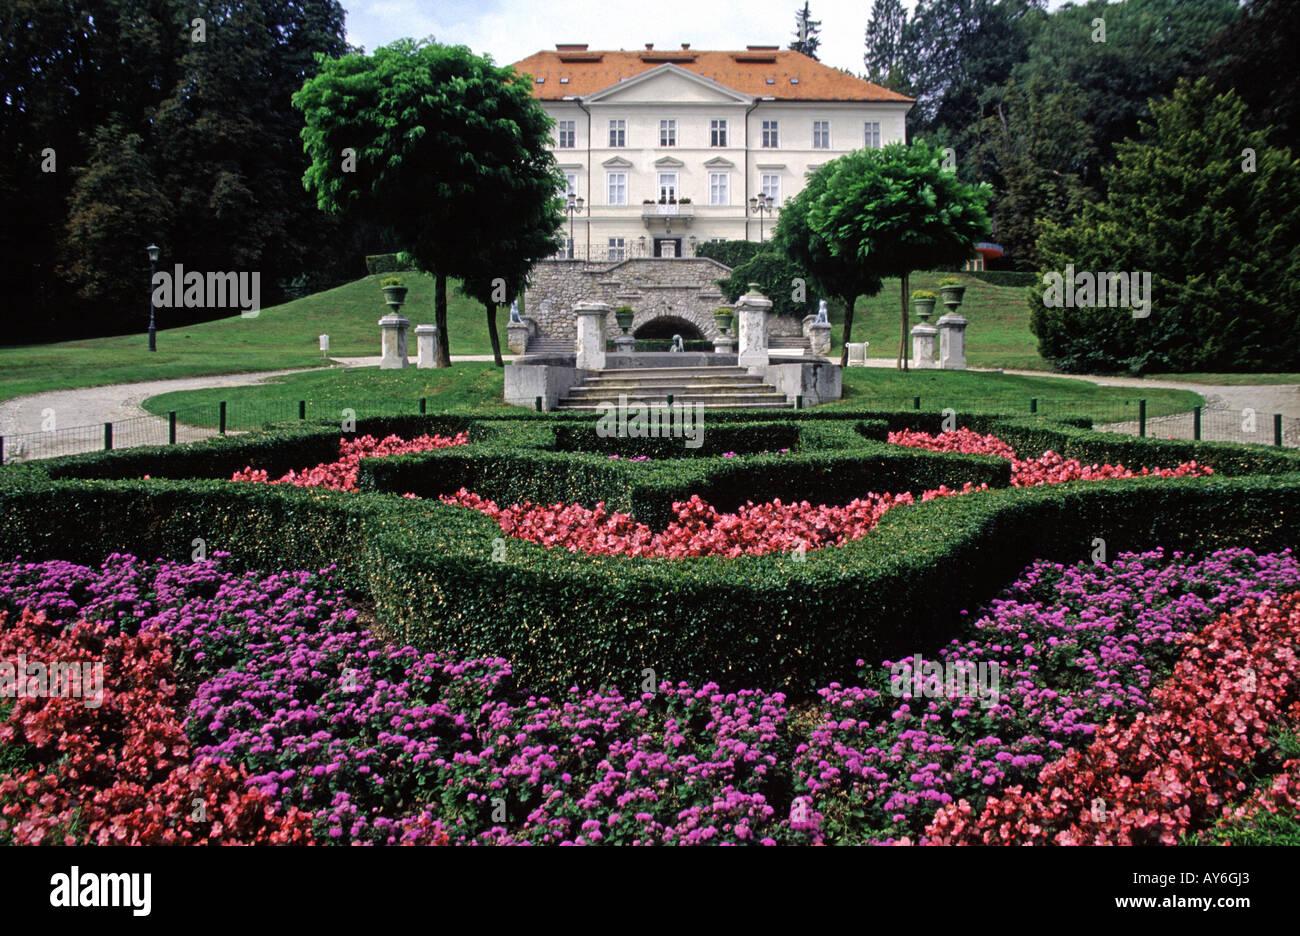 Blumenbeet vor dem International Centre of Graphic Arts in Tivoli Park Ljubljana Slowenien Stockbild